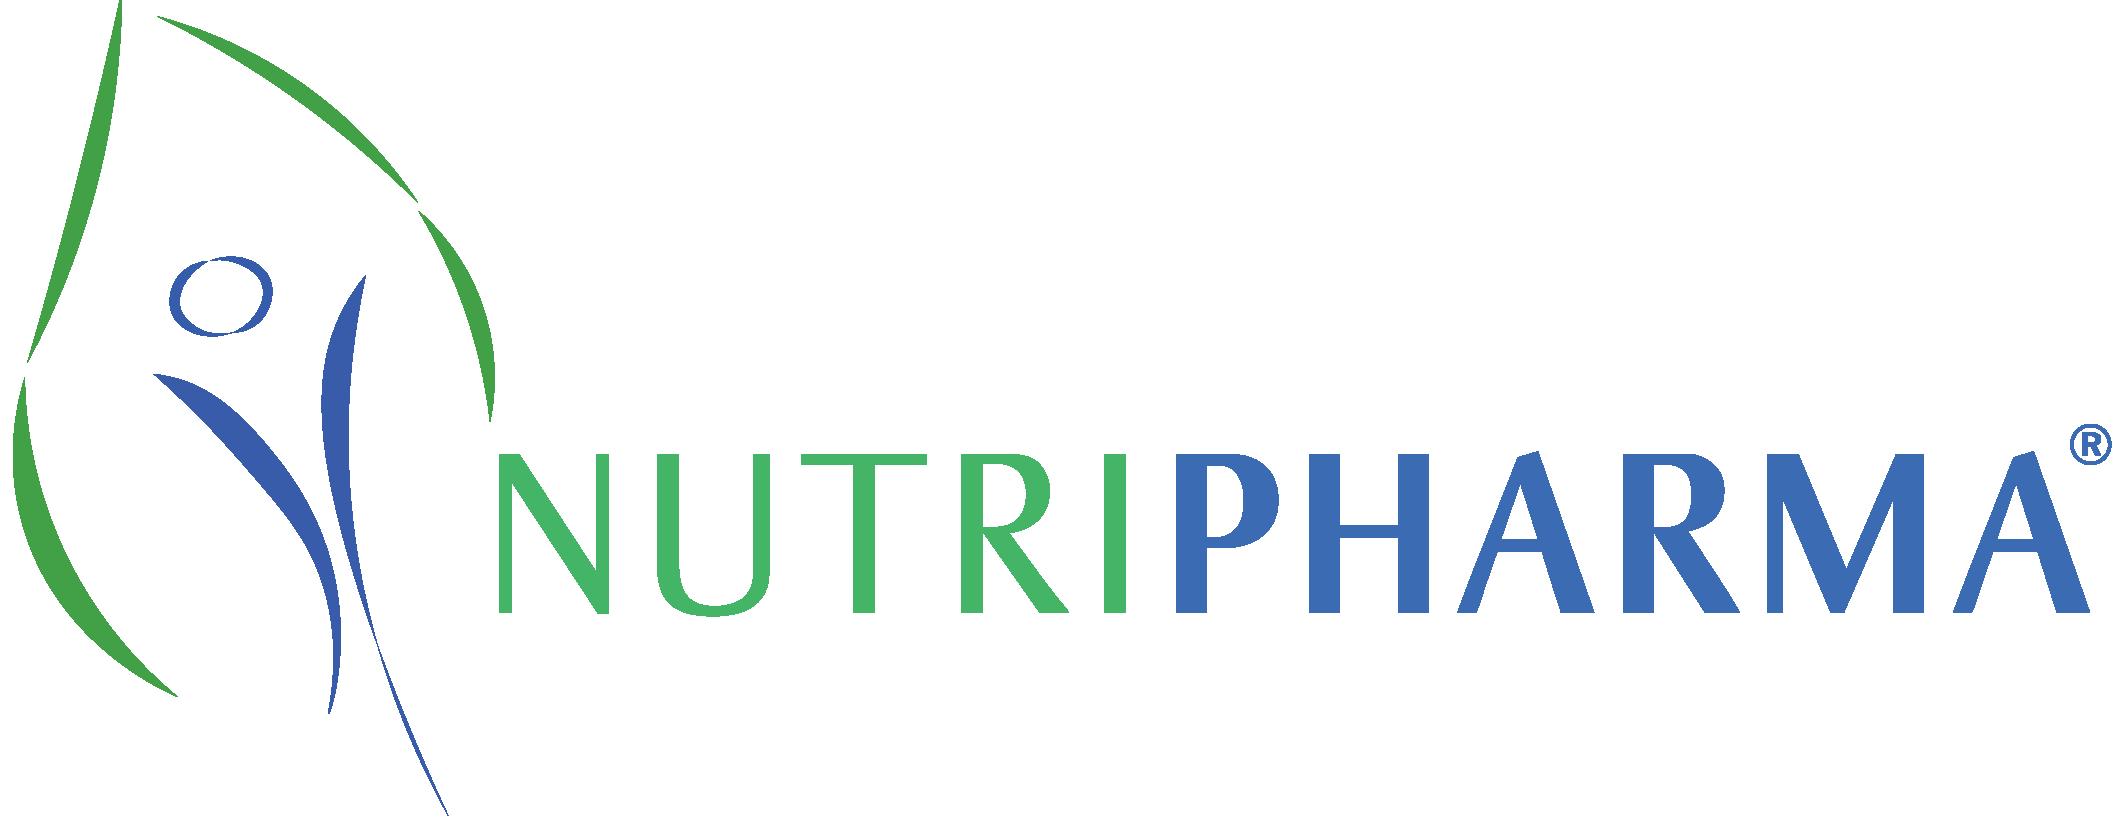 logo nutripharma-01